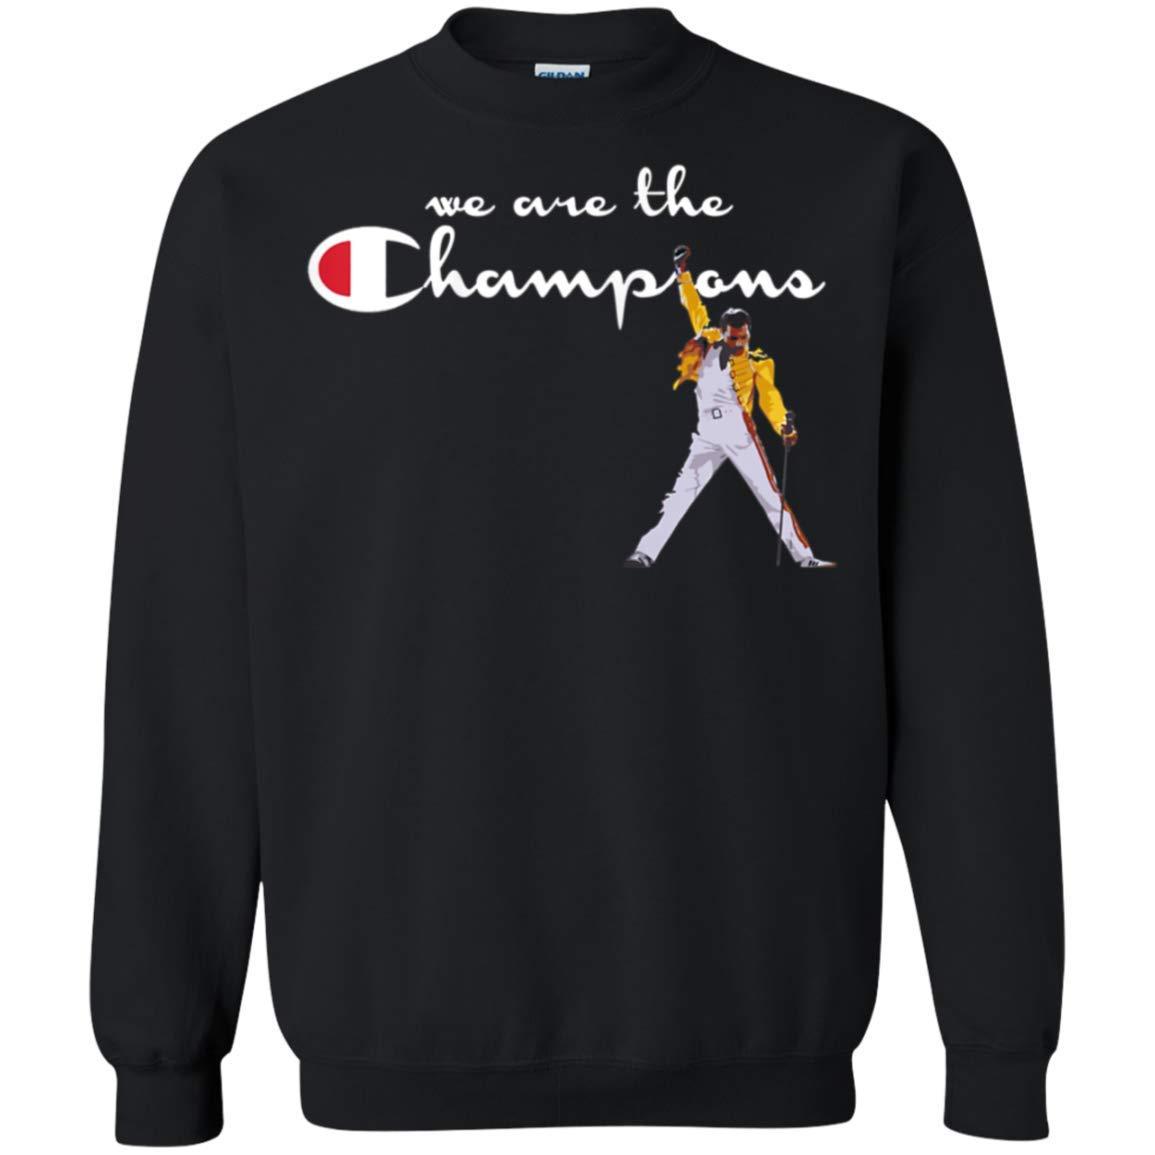 50196c0d47a0 Amazon.com: Freddie Mercury We are The Champions Crewneck Sweatshirt for Men  Women: Clothing